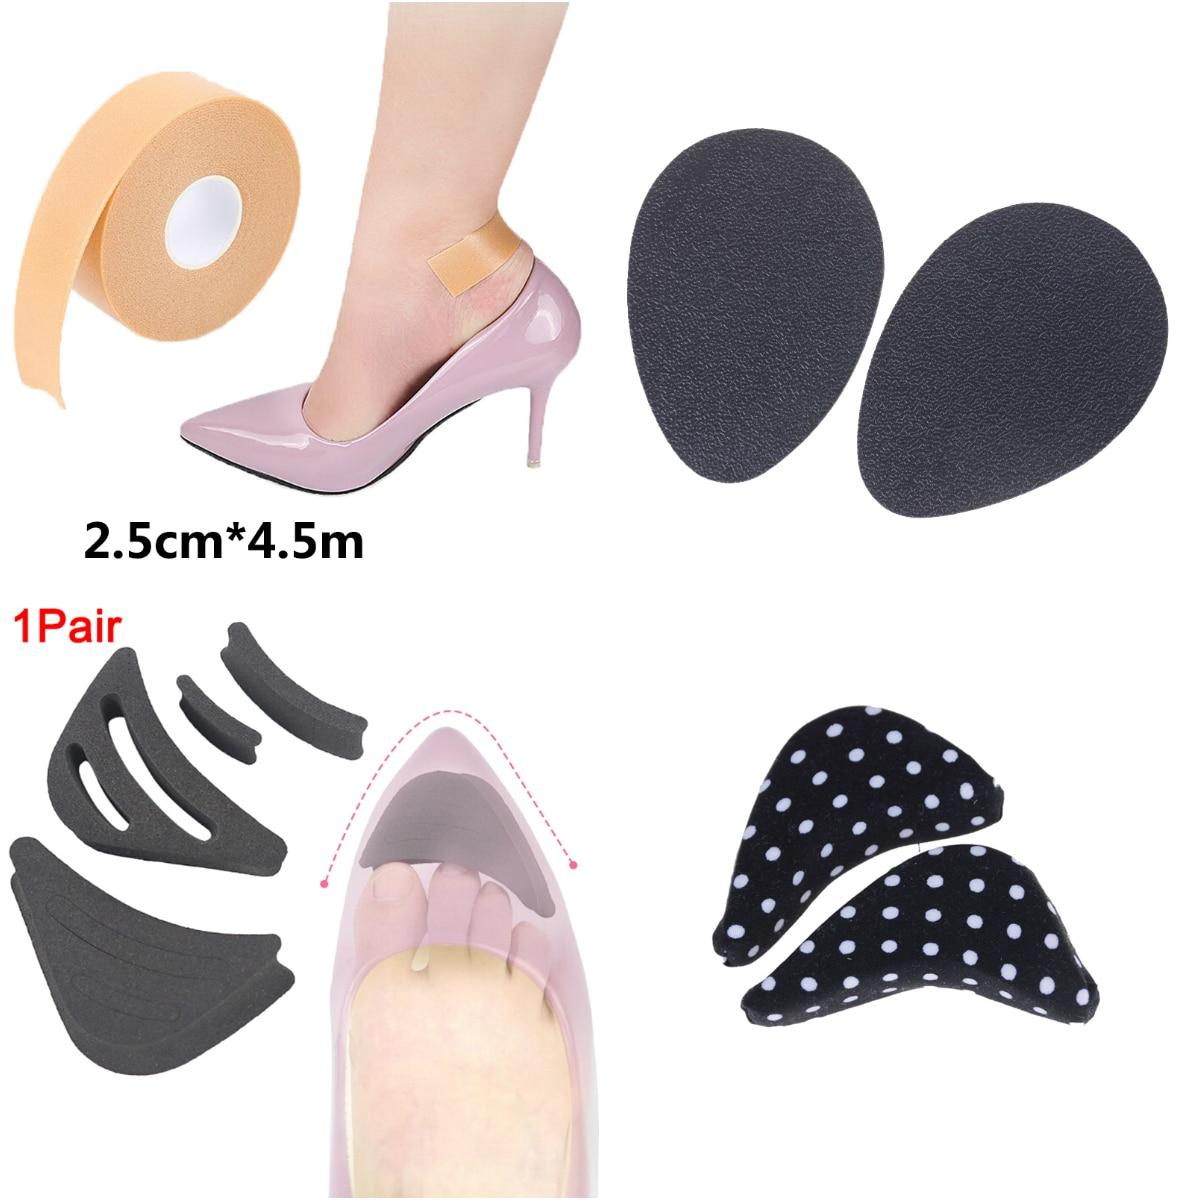 1Roll Anti-Wear Foam Heel Sticker Tape Cotton Patch Foot Care Blister Plaster Waterproof First Aid Blister Pedicure Pad Insole